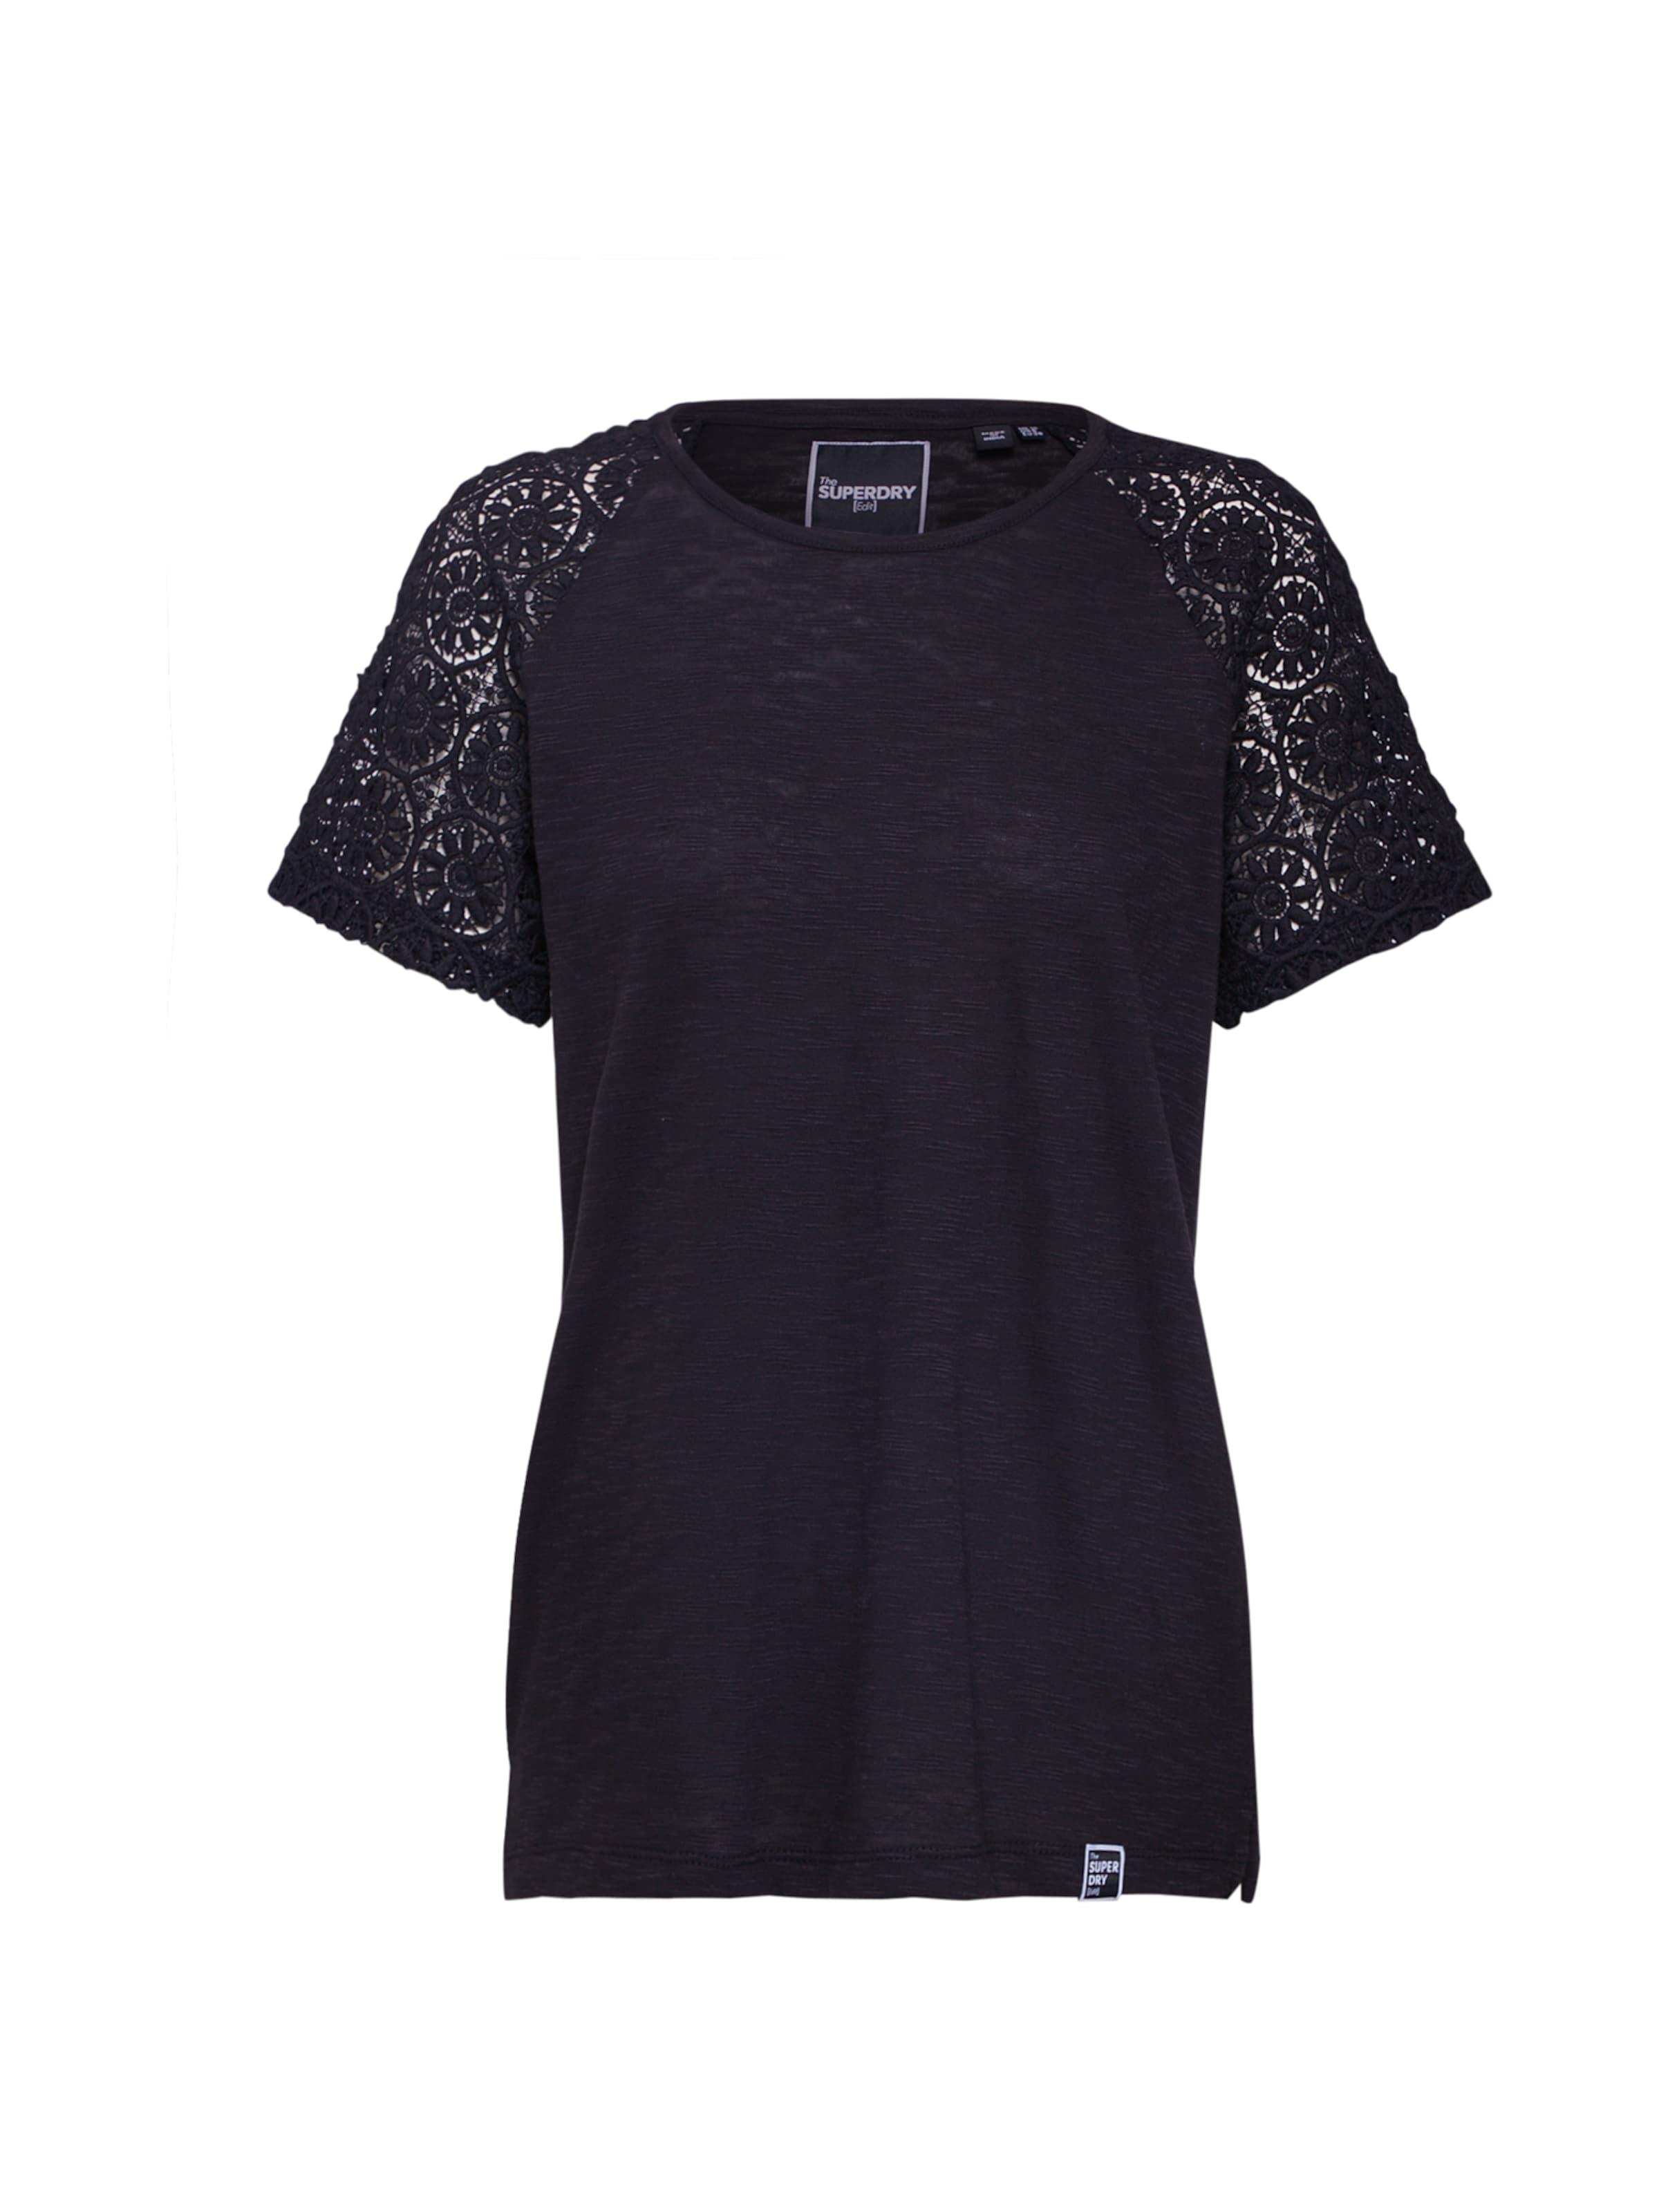 Superdry shirt 'elisa' Blanc En T DbIY29eWEH